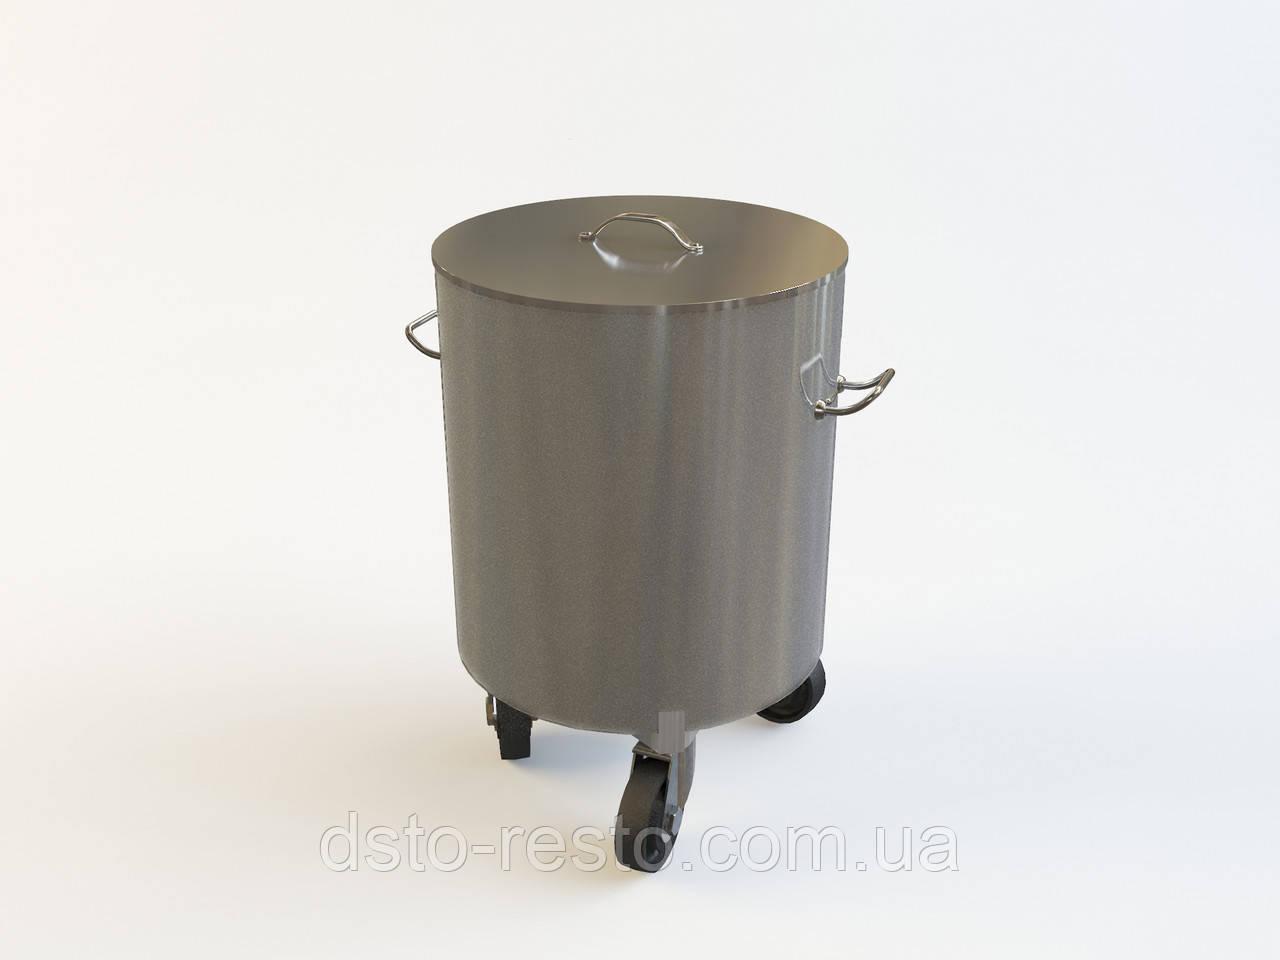 Бак для сбора отходов на 80 л